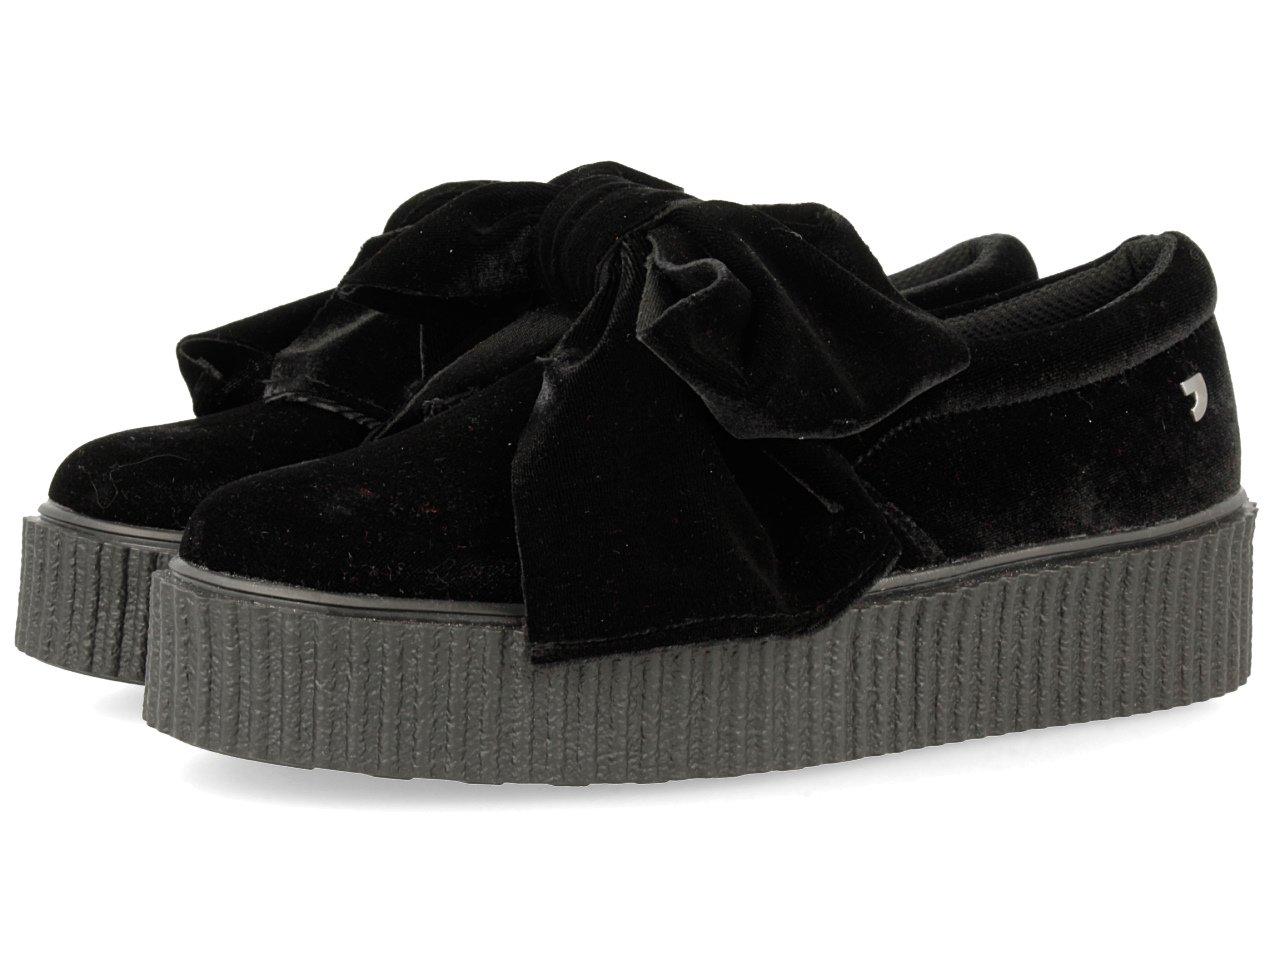 Gioseppo 30666, Zapatillas para Mujer 37 EU|Negro (Black)